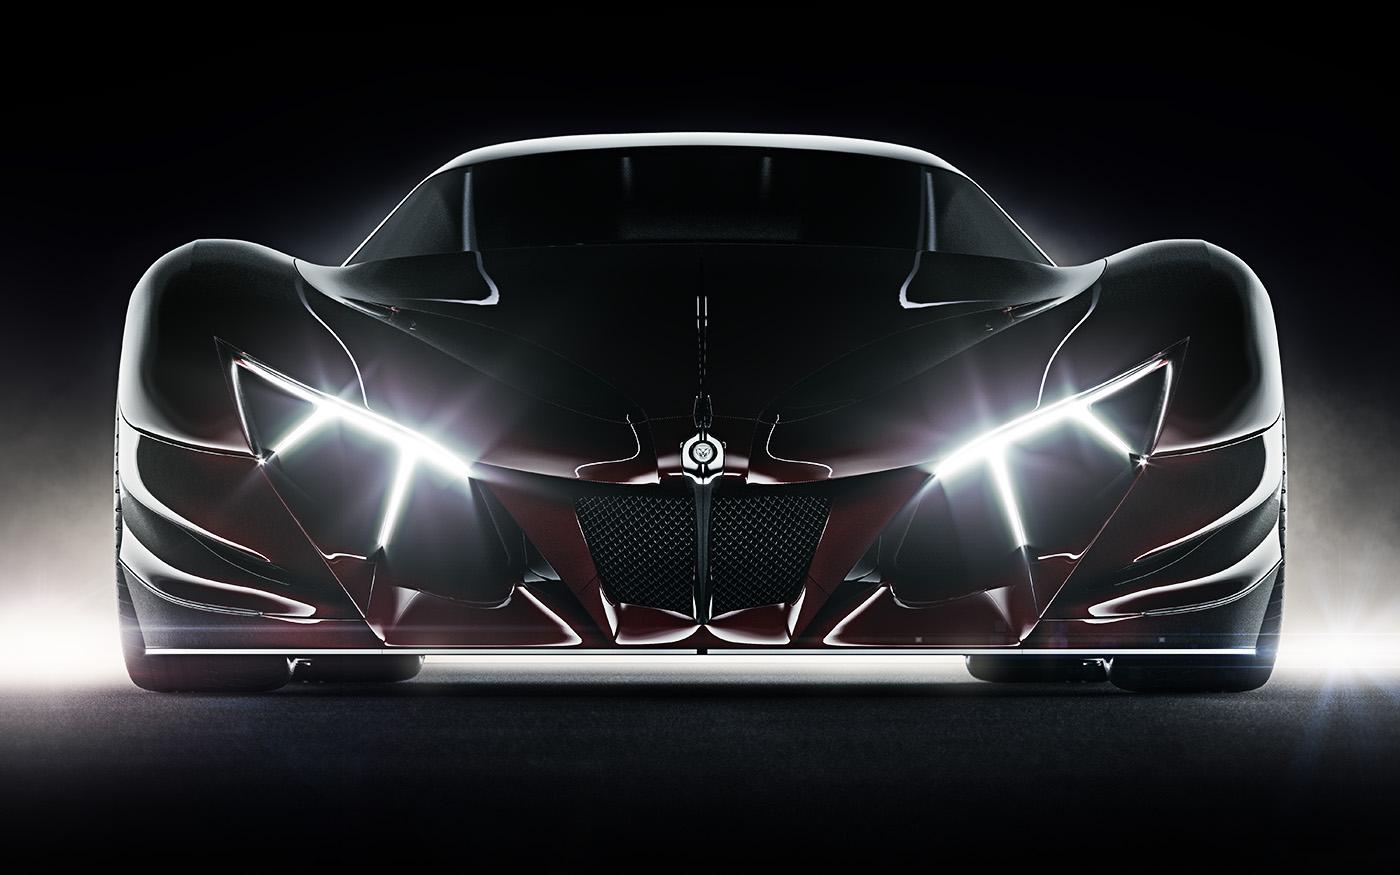 jaguar Automotive design sculptural red car design supercar hypercar